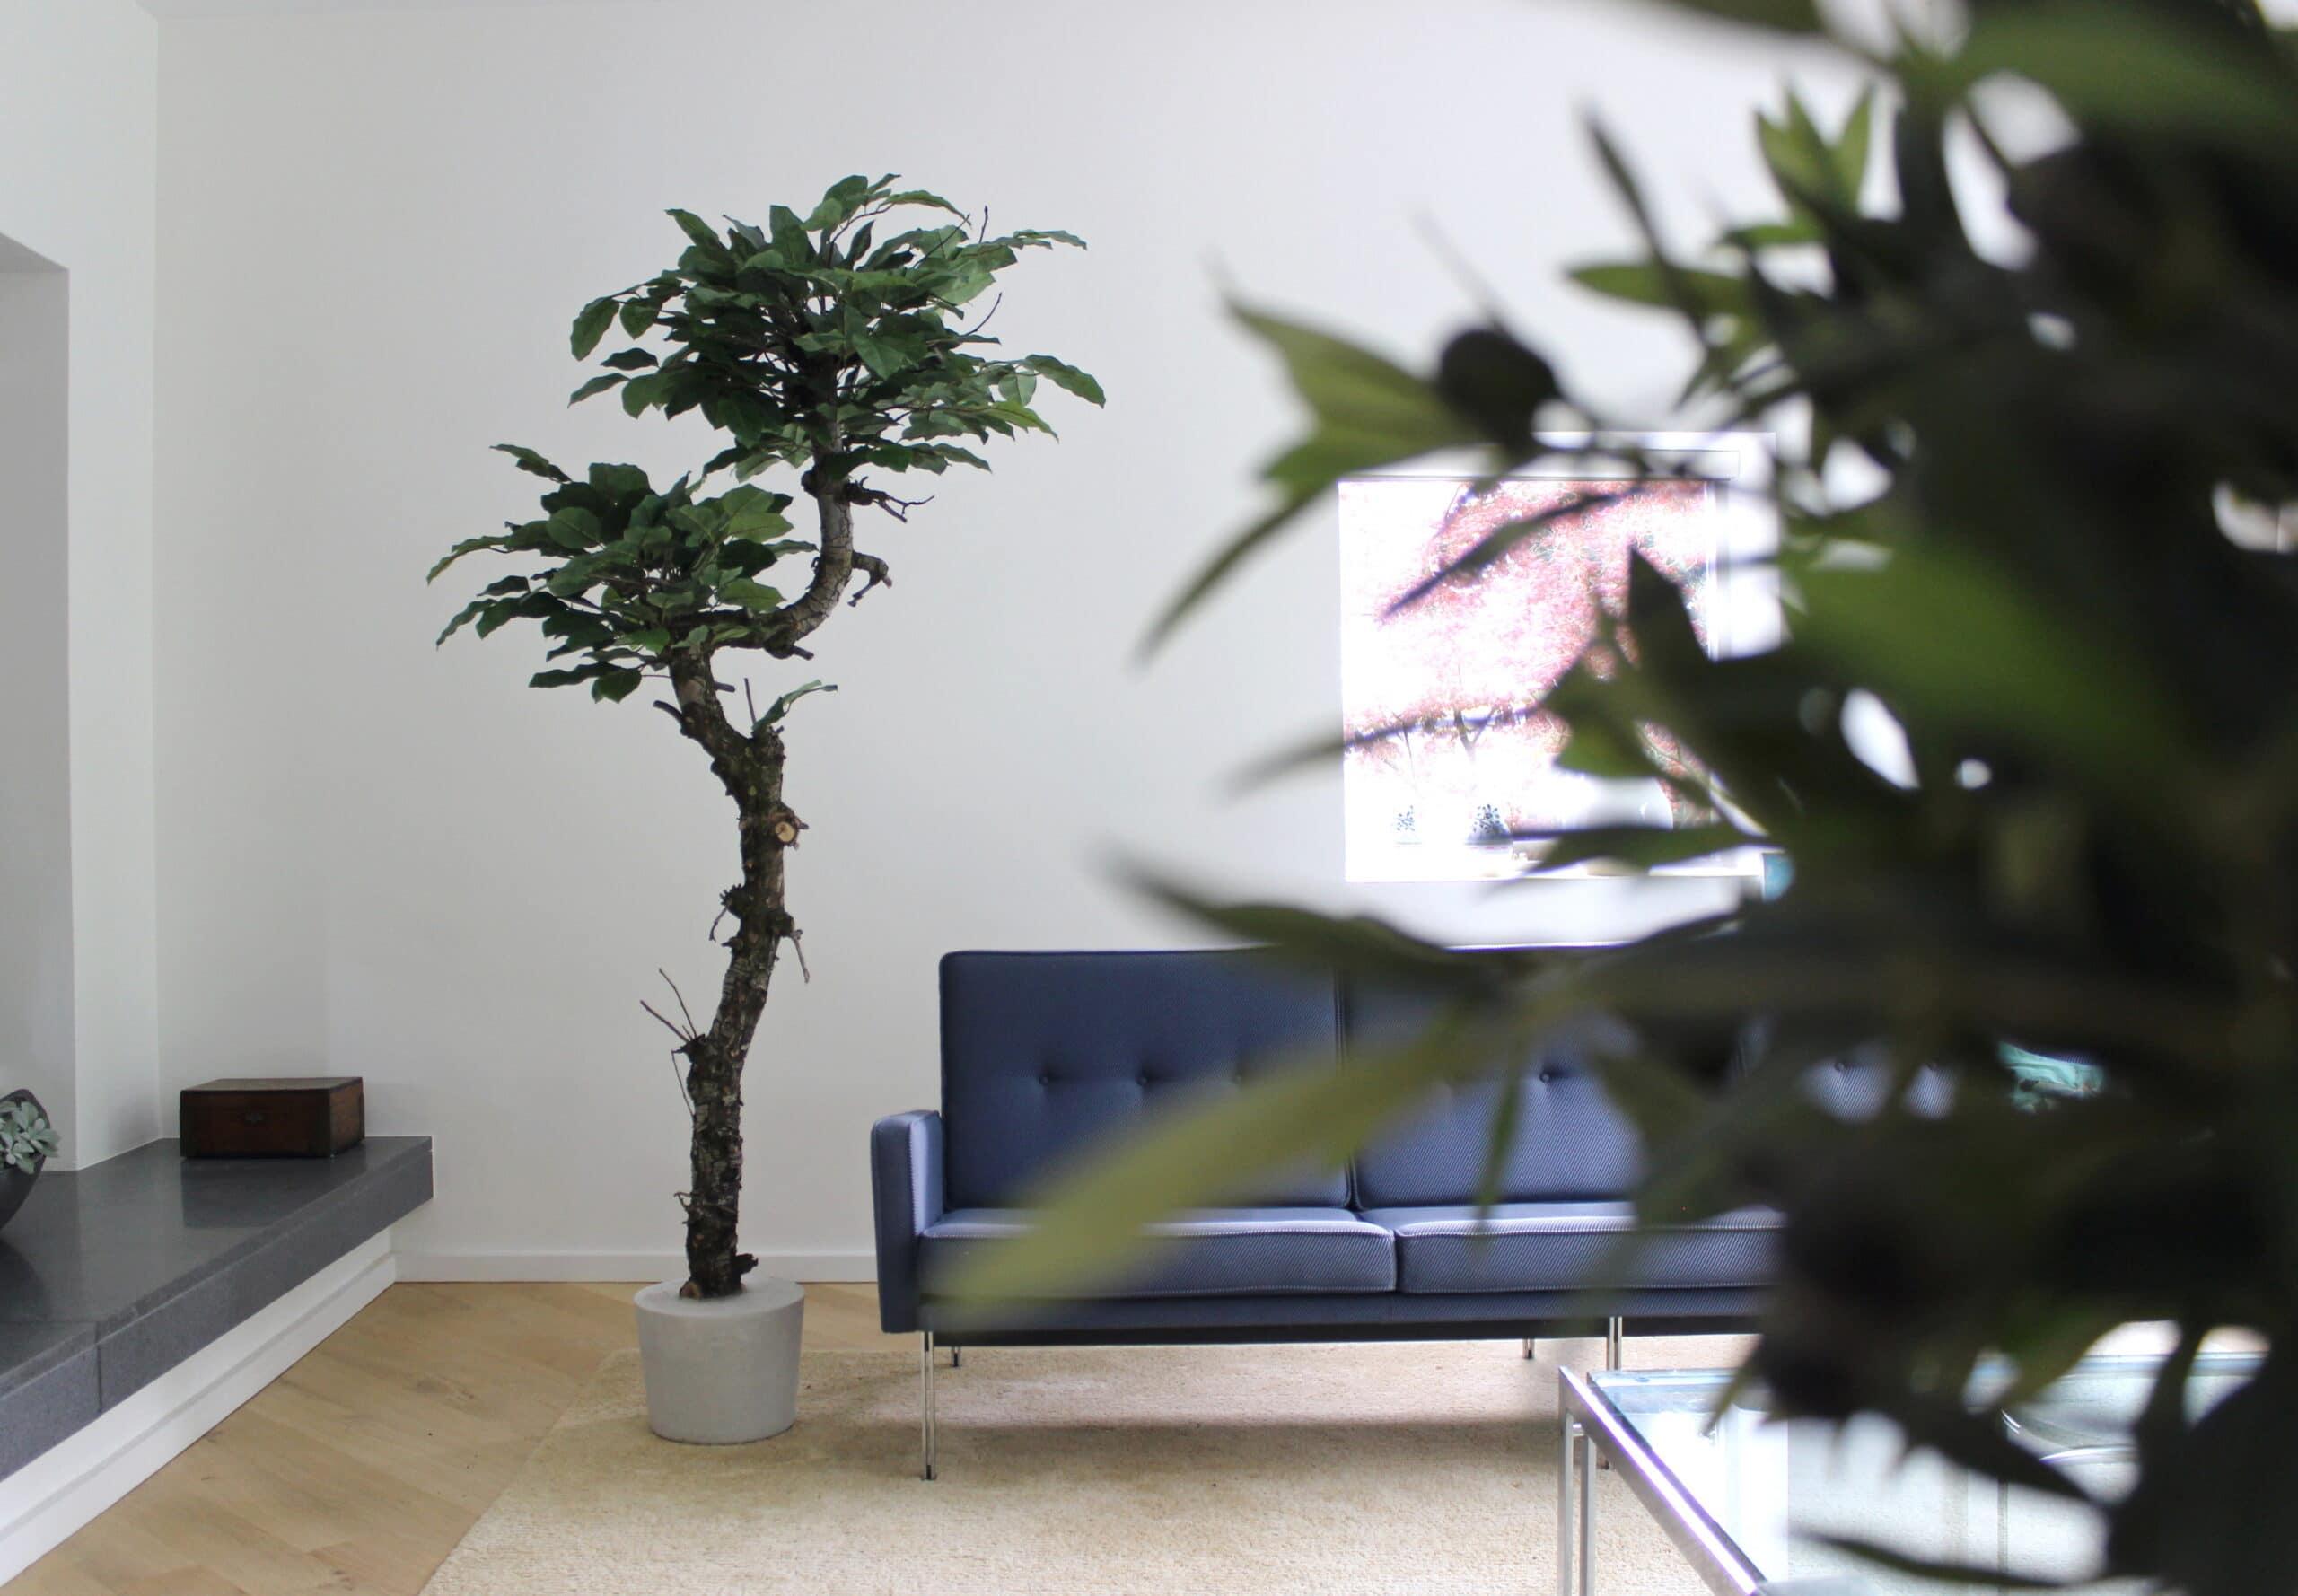 kunstboom groot klein boommade homemade interieurbomen interieur kunstboom binnenboom boom voor binnen grote kunstplant